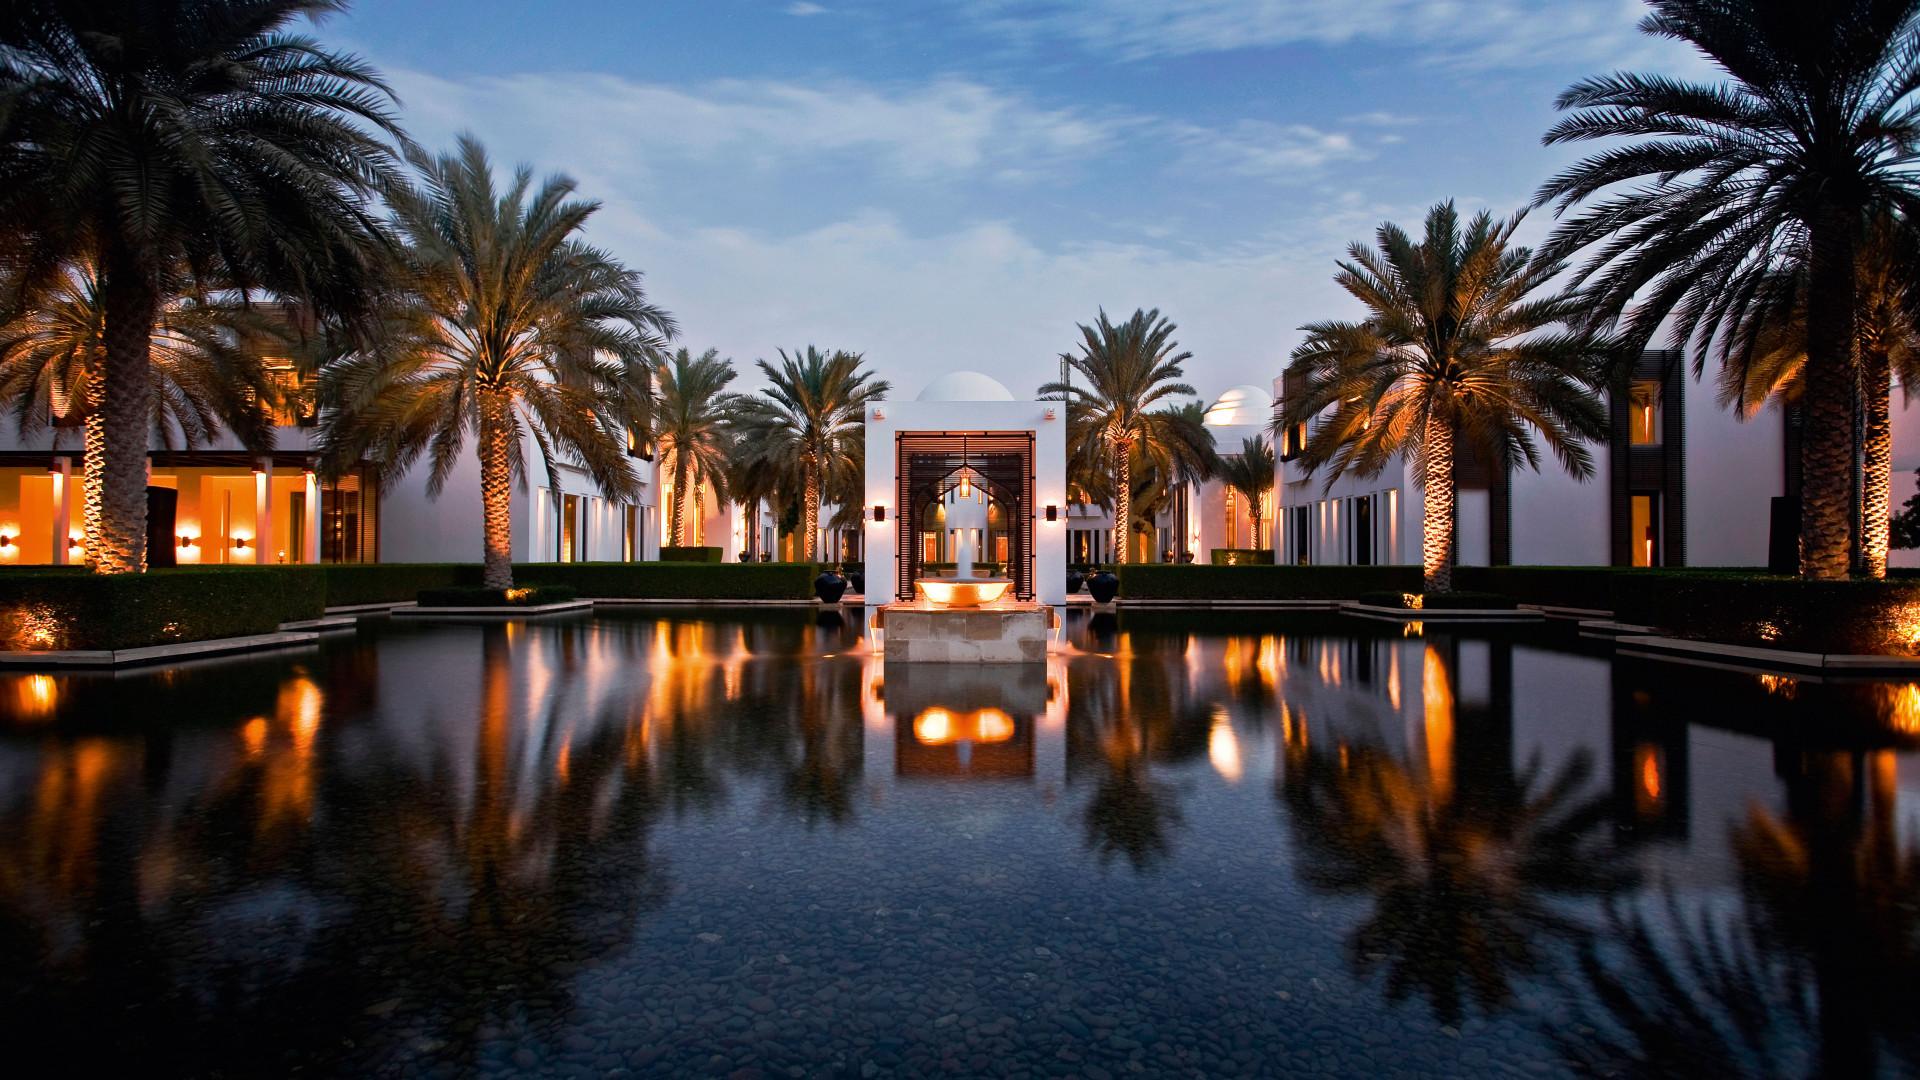 Al Bustan hotel swimming pool, Oman